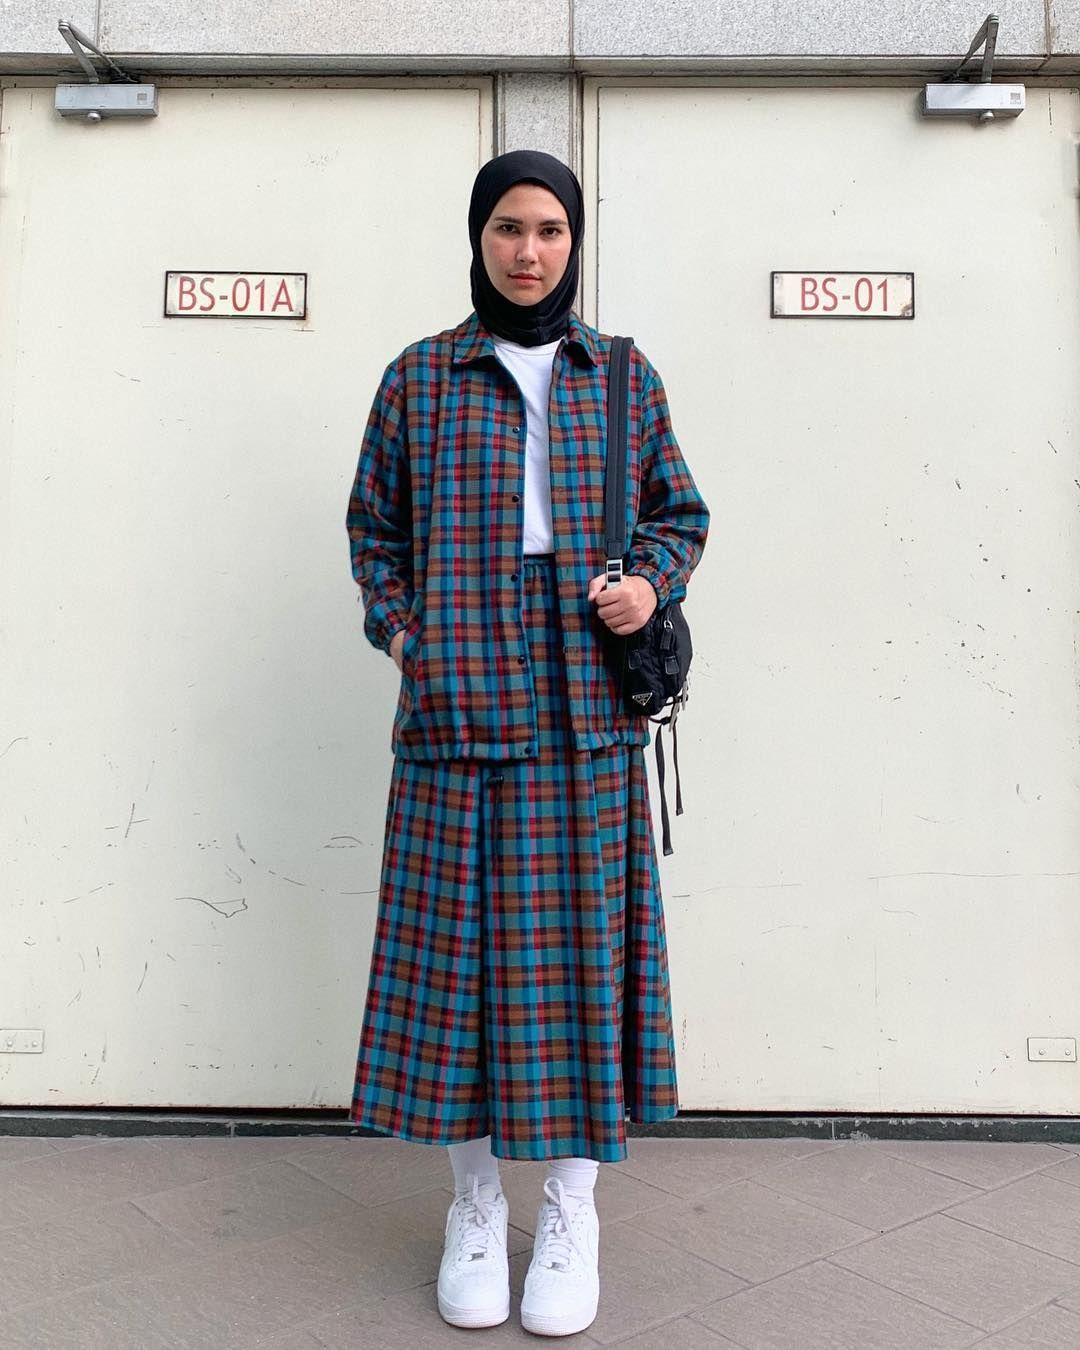 Biar Gaya-mu Nggak Membosankan, Simak 5 Tips Hijab A la Rani Hatta